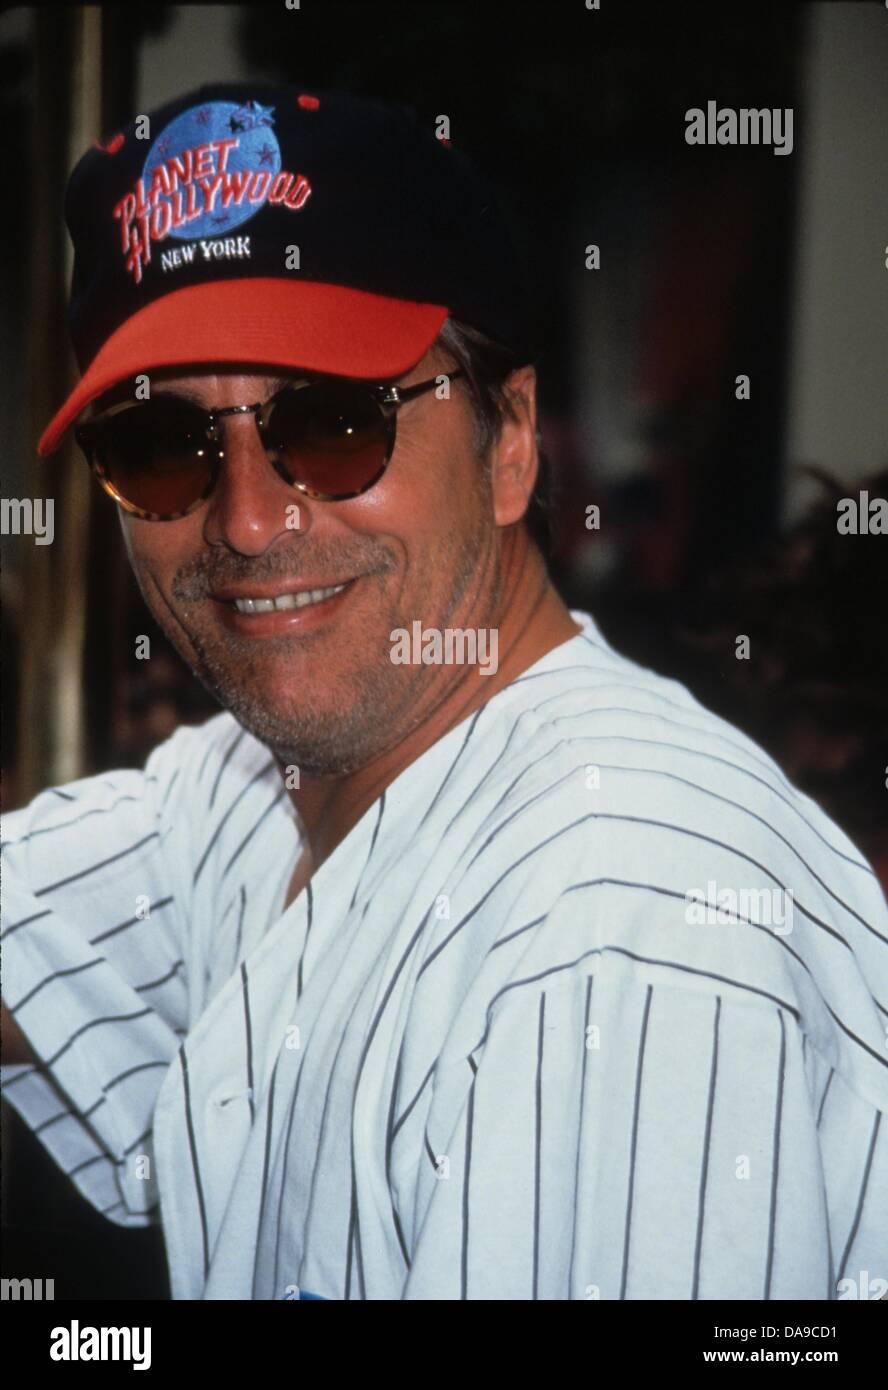 DON JOHNSON 1993.l6190st.(Credit Image: © Stephen Trupp/Globe Photos/ZUMAPRESS.com) - Stock Image